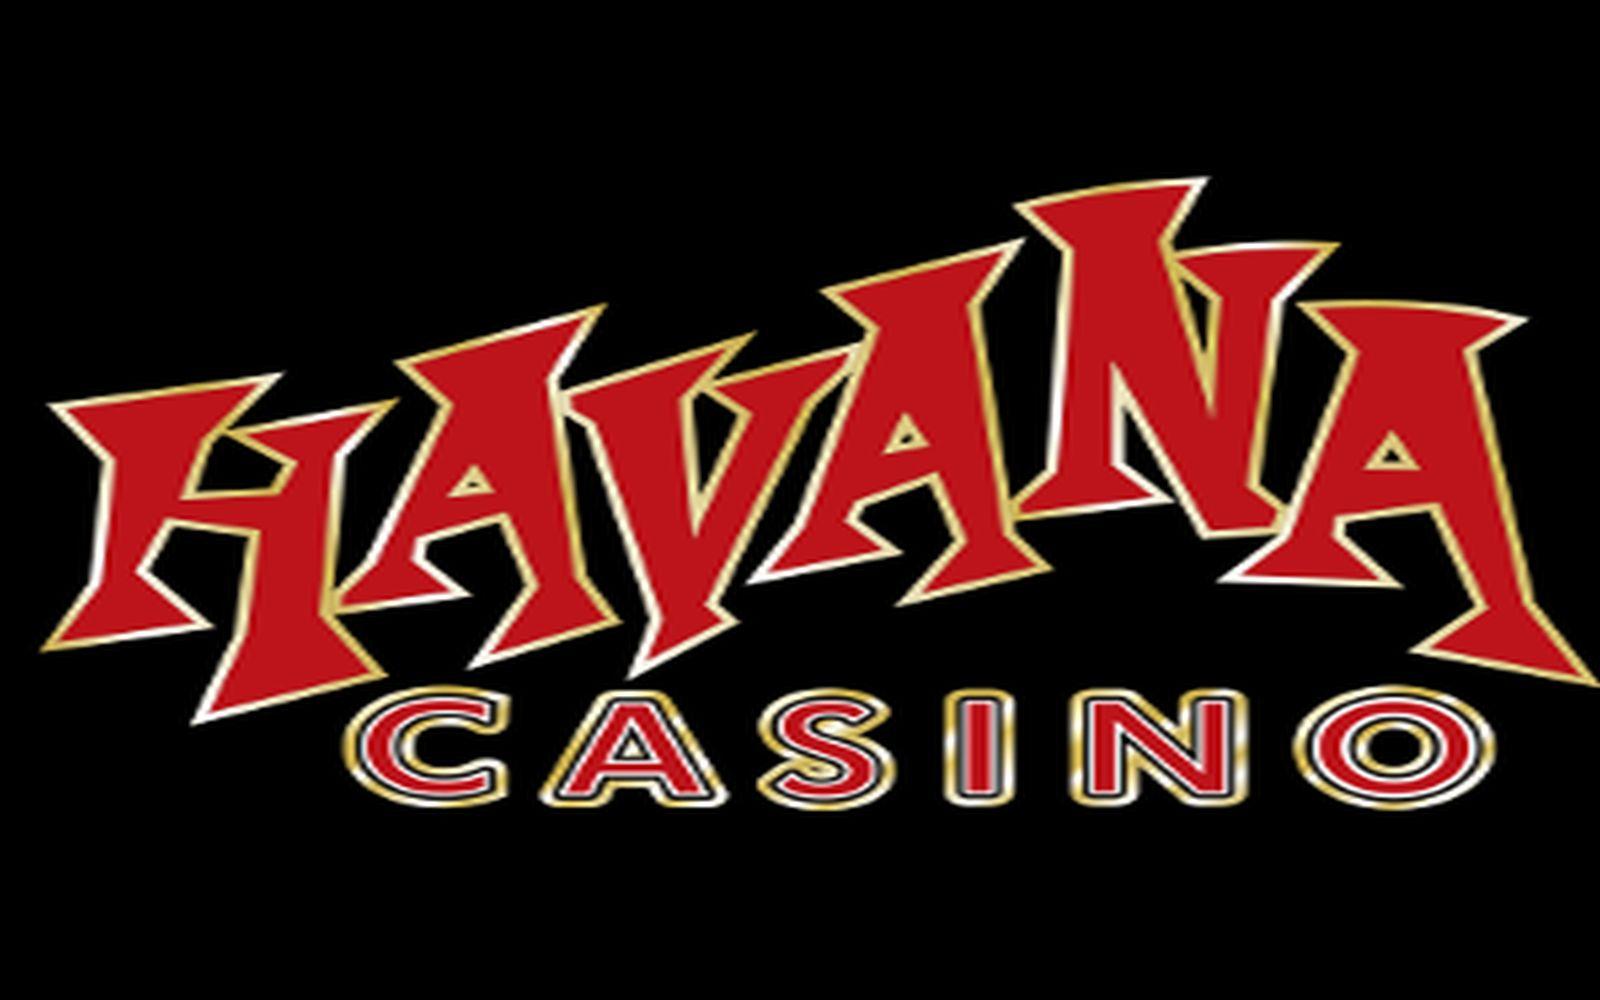 Havana Cañaveral